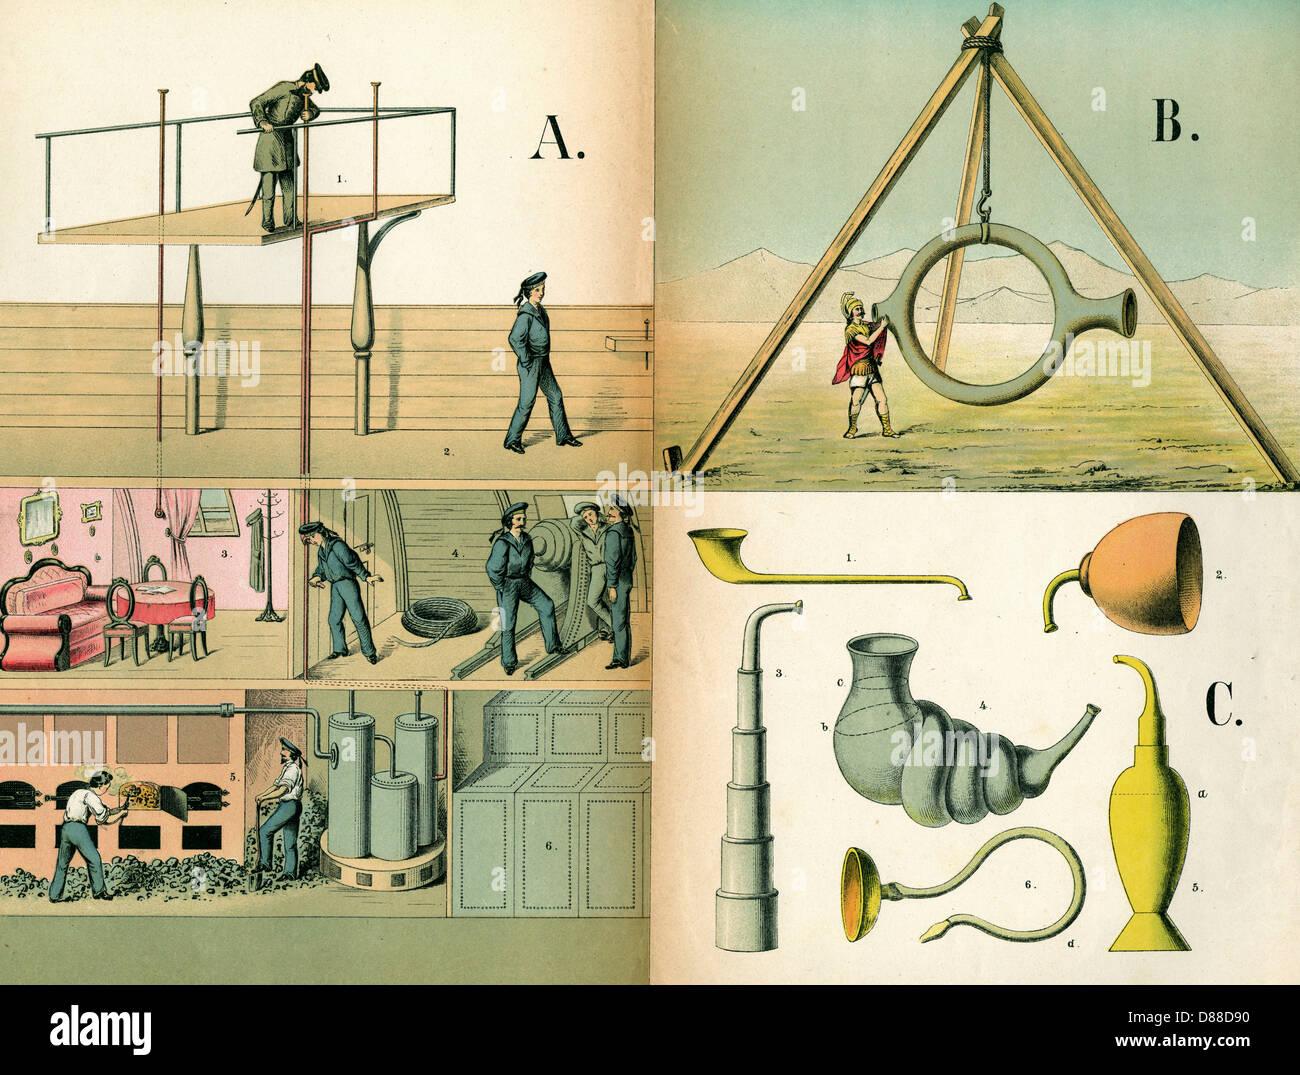 Acoustics 1882 - Stock Image